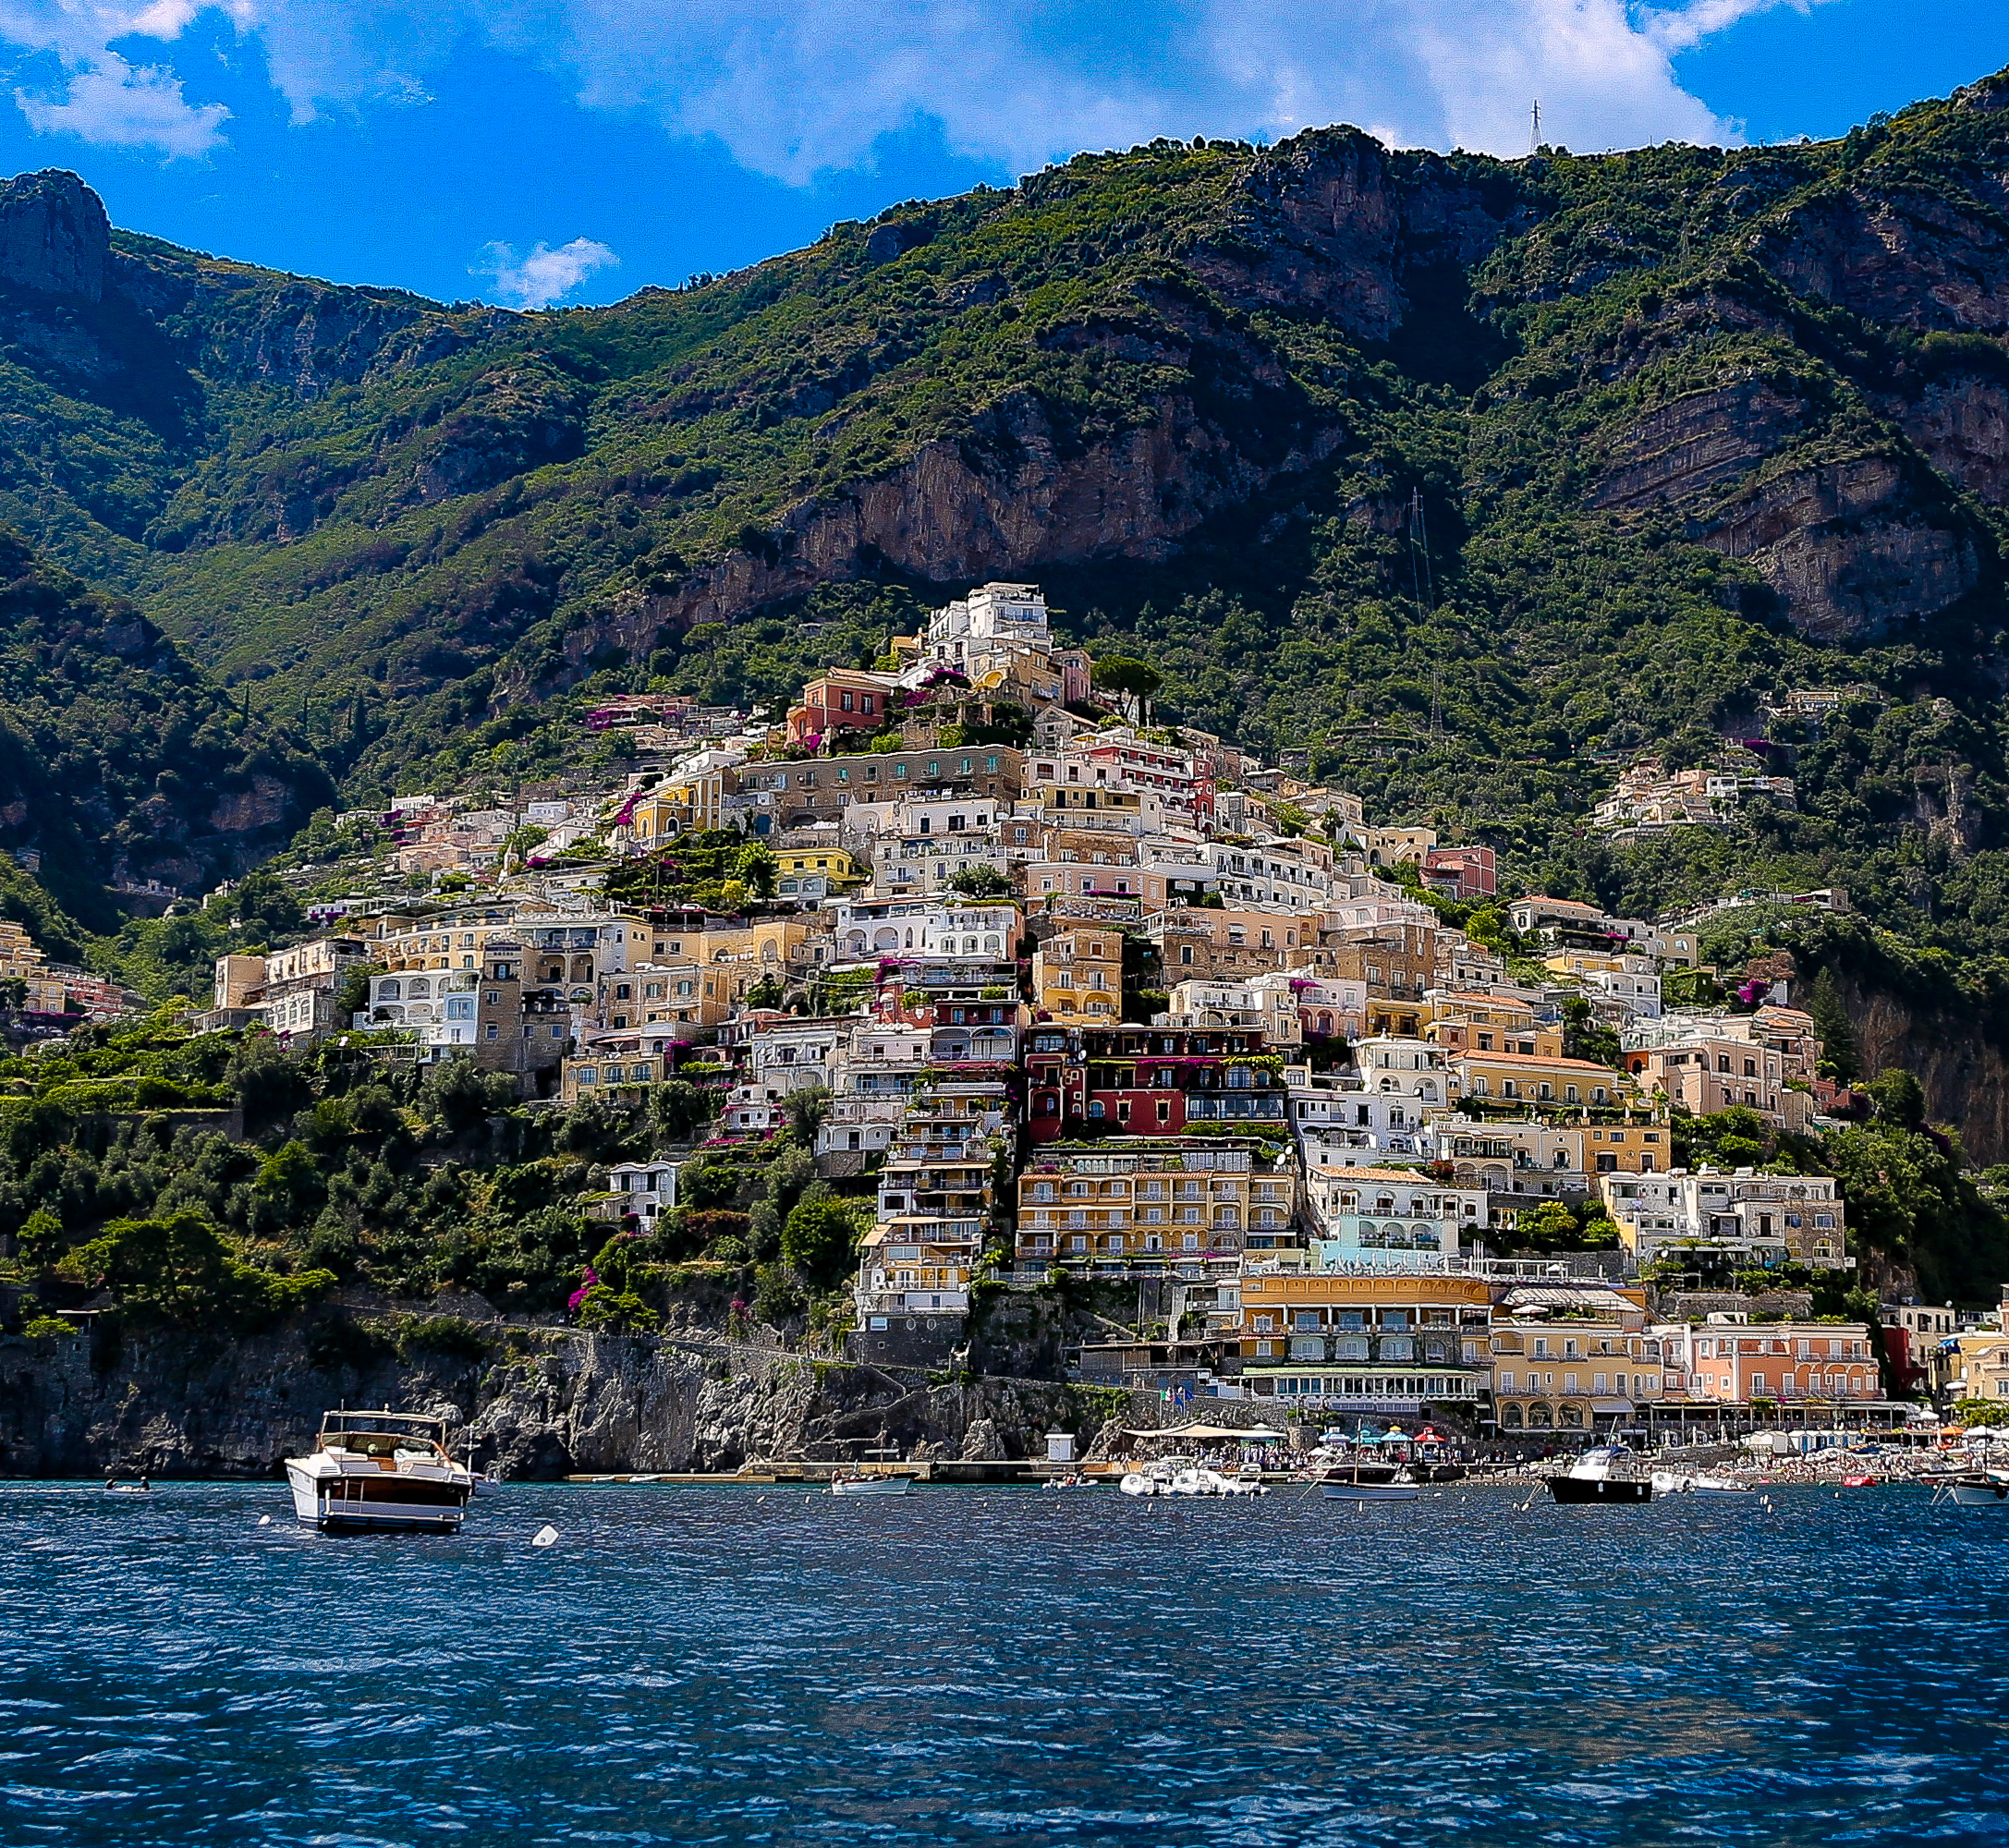 4 Days In Positano Italy The Bond Street Butcher